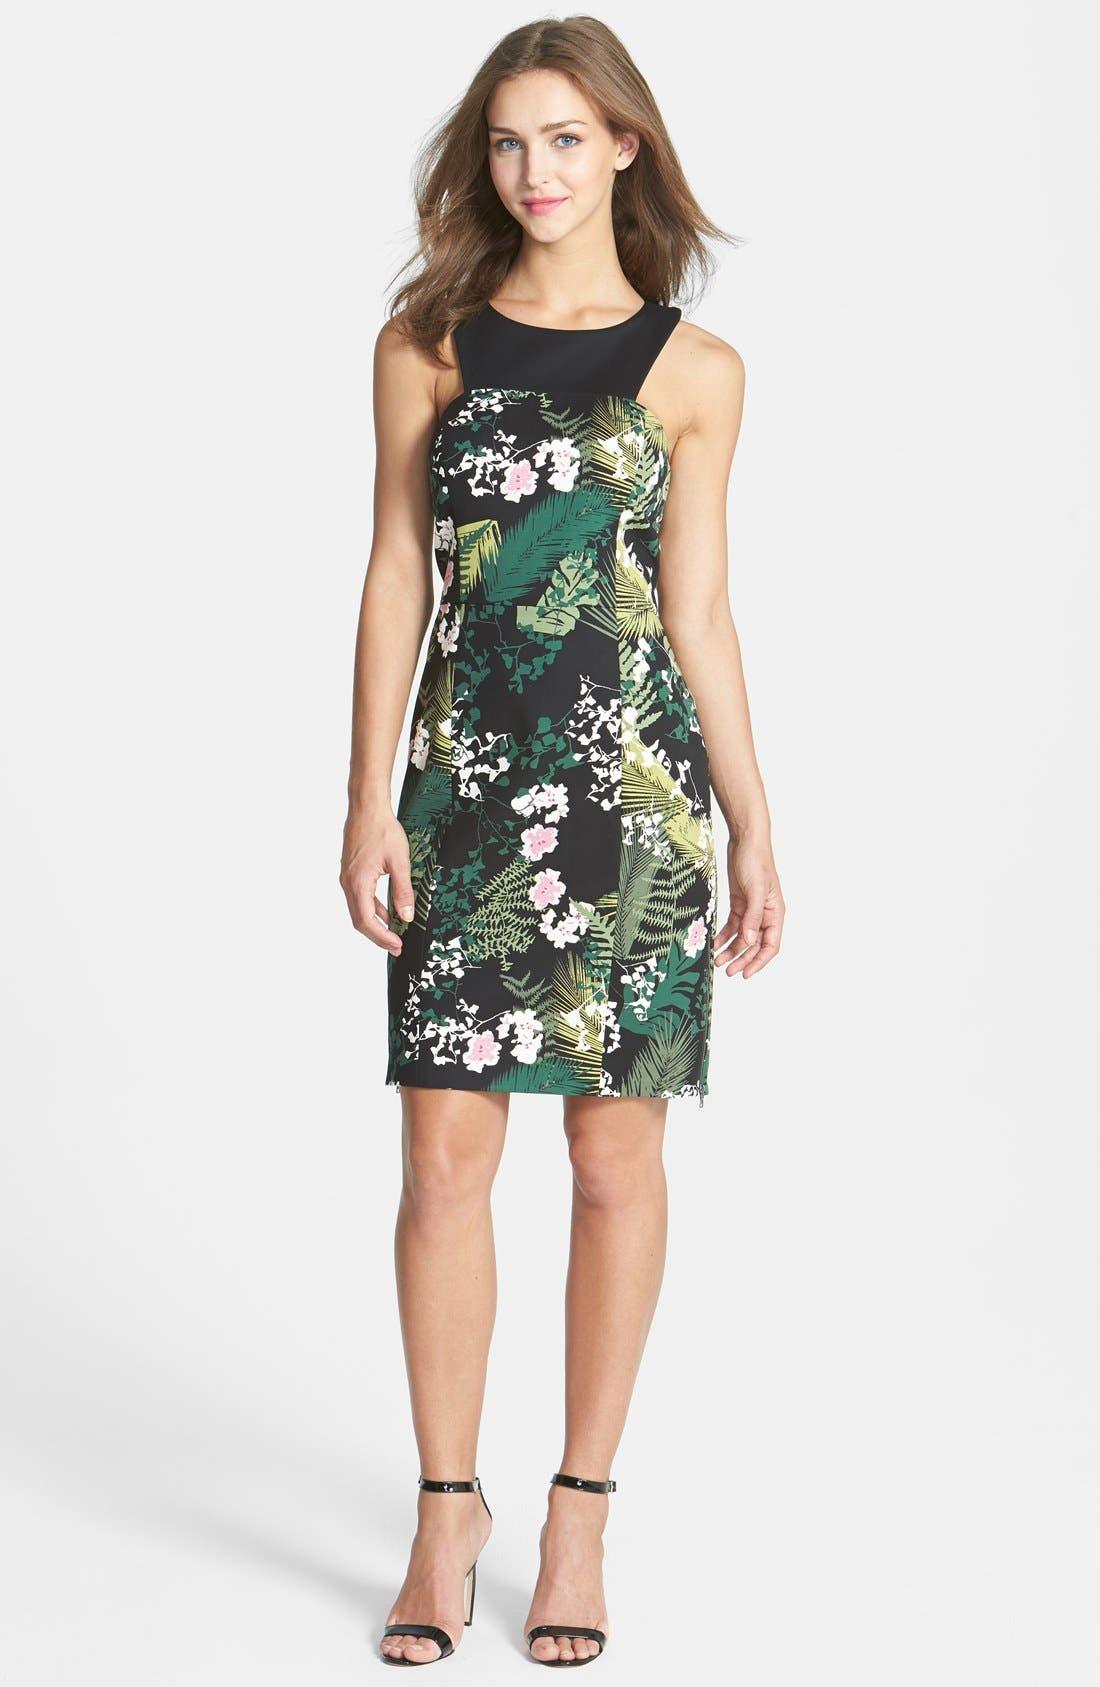 Main Image - Adrianna Papell 'Rainforest' Print Cutout Stretch Cotton Dress